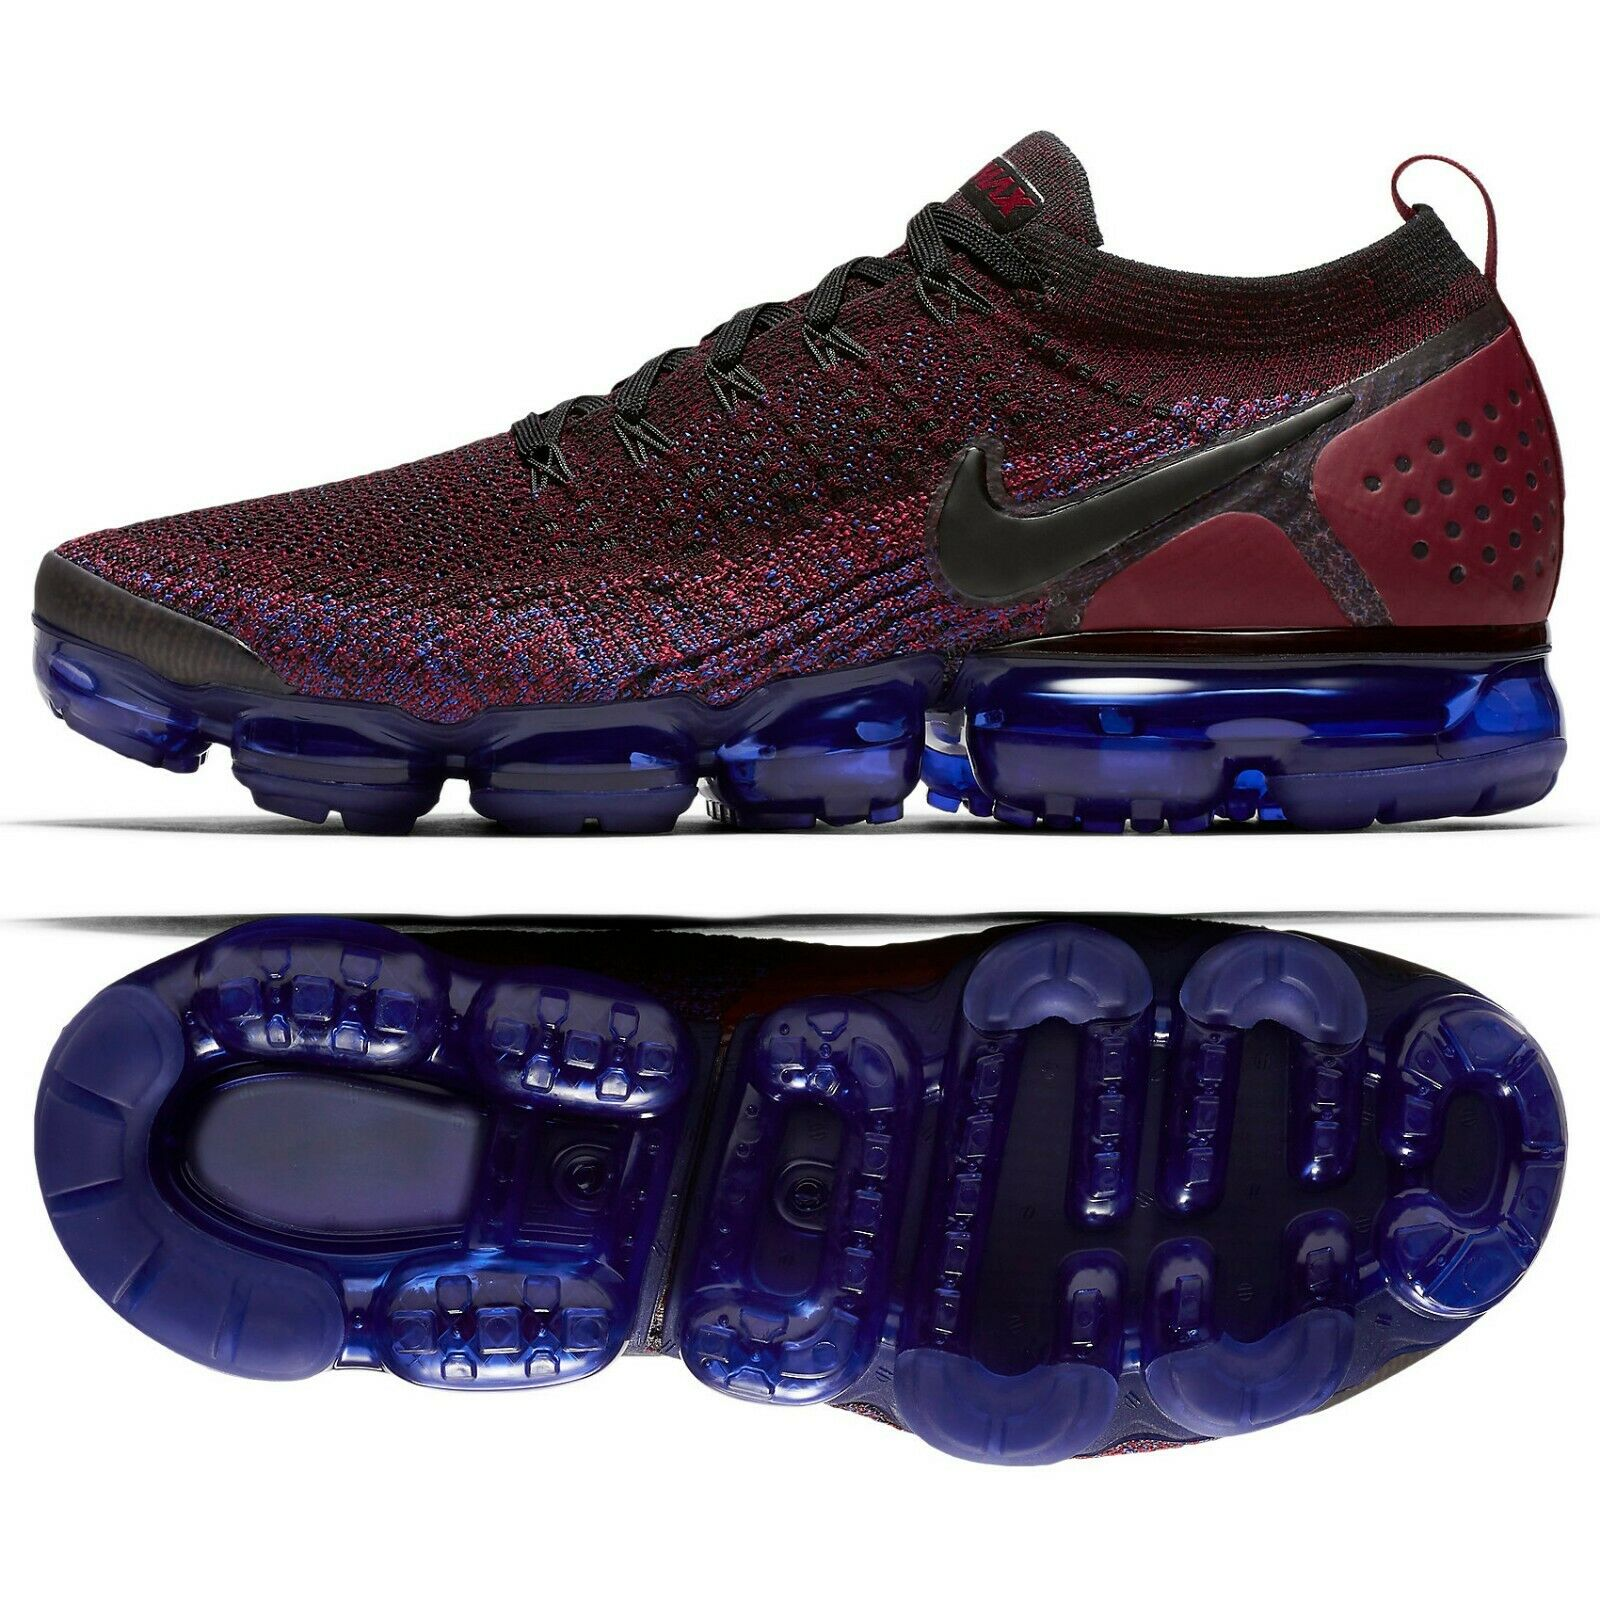 Nike Air VaporMax Flyknit 2 942842-006 Black Team Red Racer bluee Men's shoes